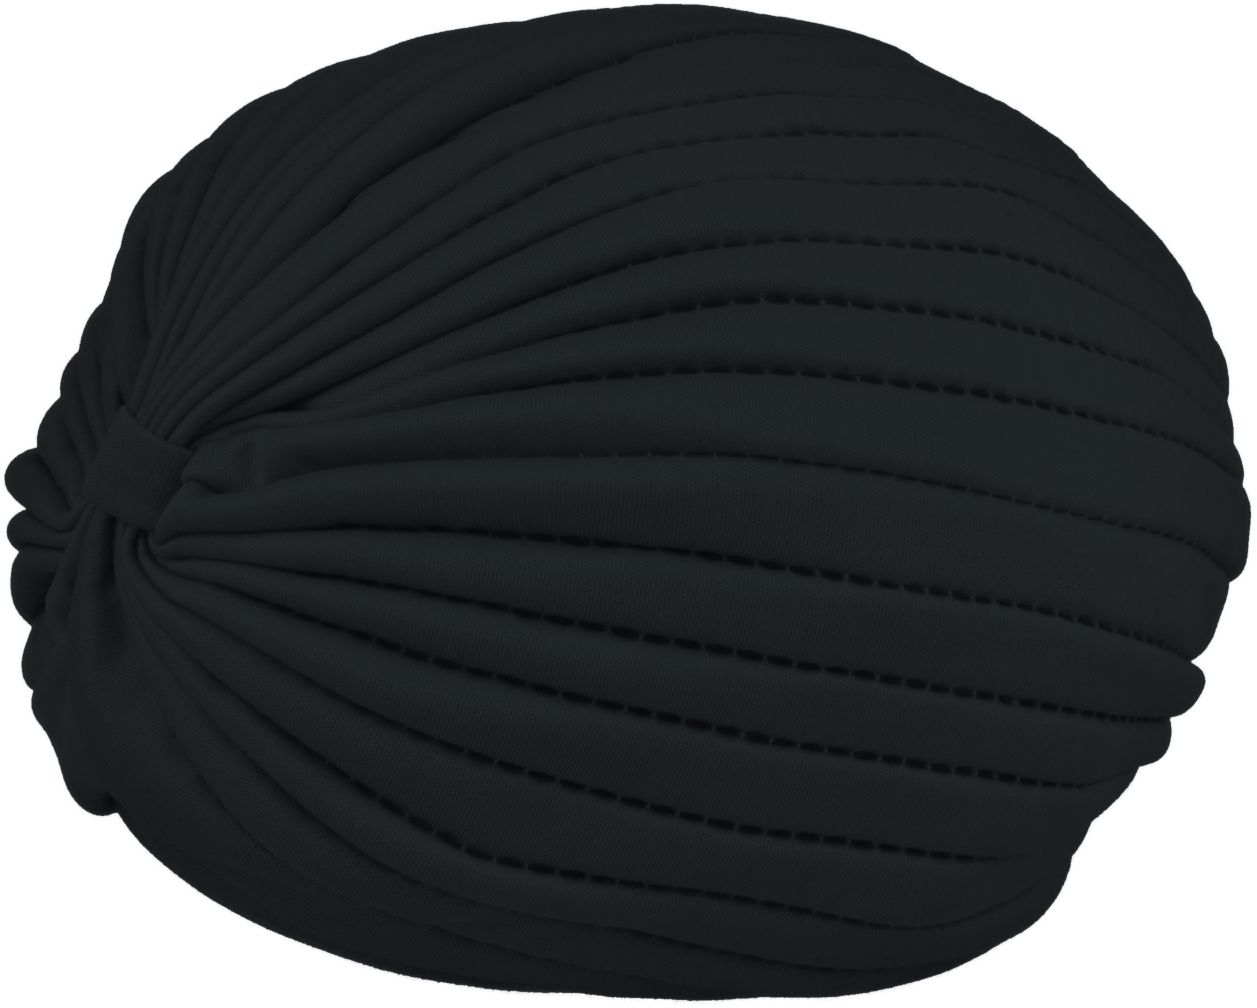 eae2283bl_turban-pinup-rockabilly-retro-40s-50-s-emma-noir